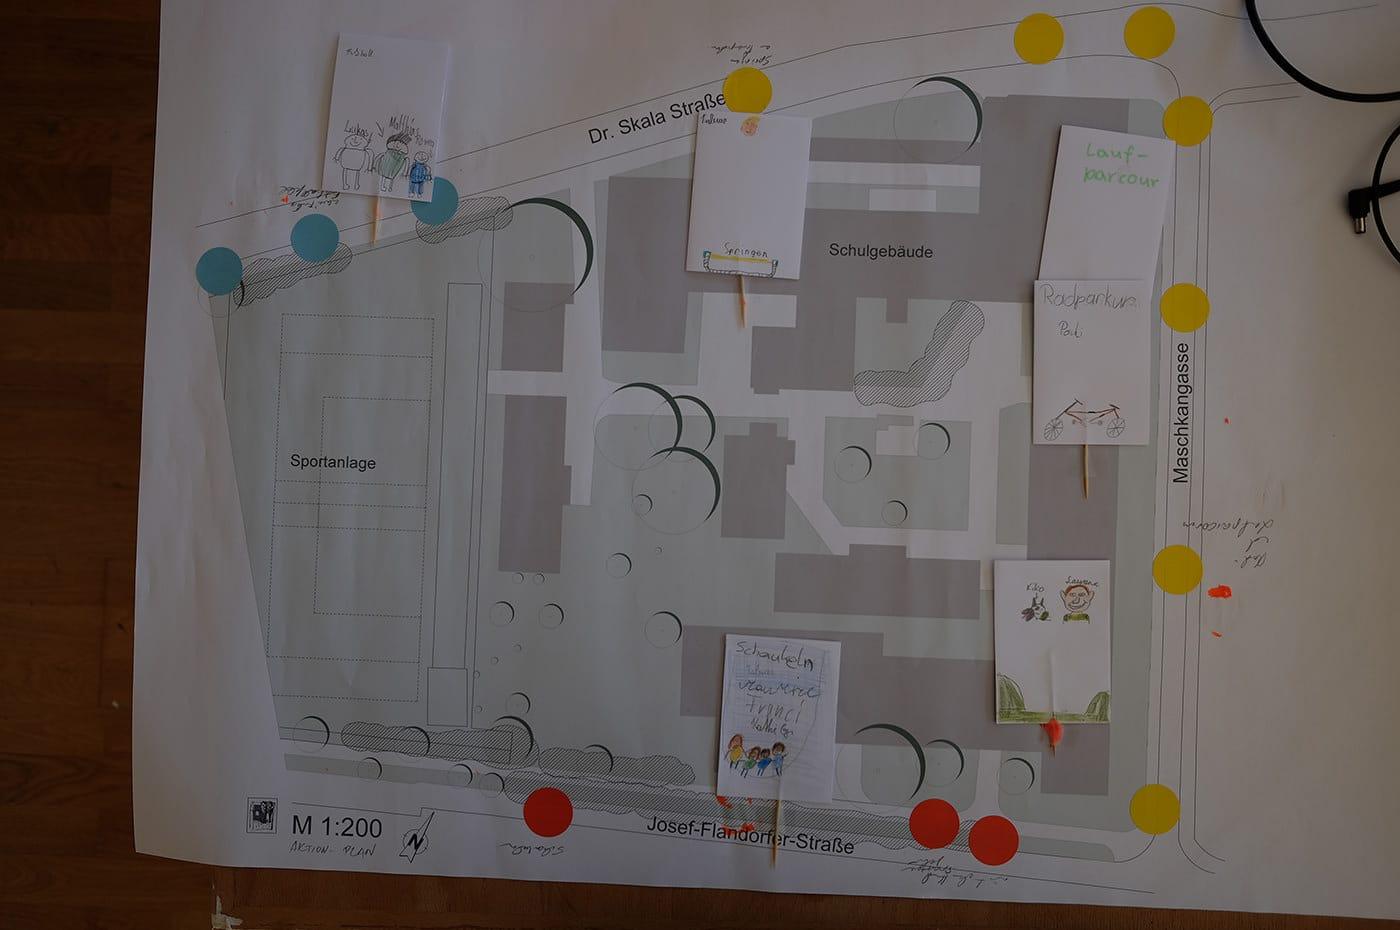 MK Landschaftsarchitektur- Projekt wasgehtab?